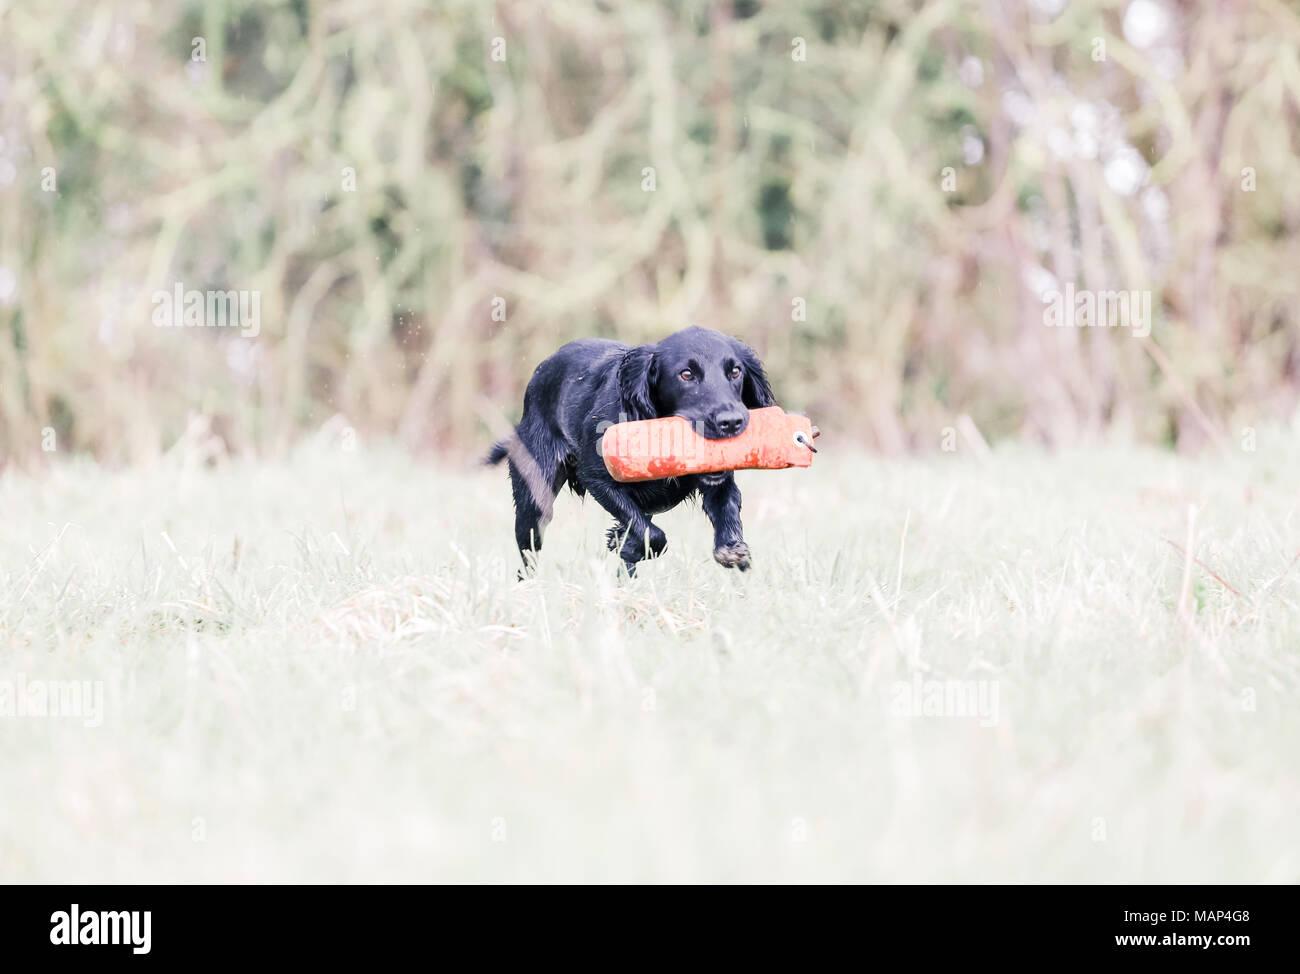 Formation chiens Cocker travail dans la campagne, Royaume-Uni Photo Stock